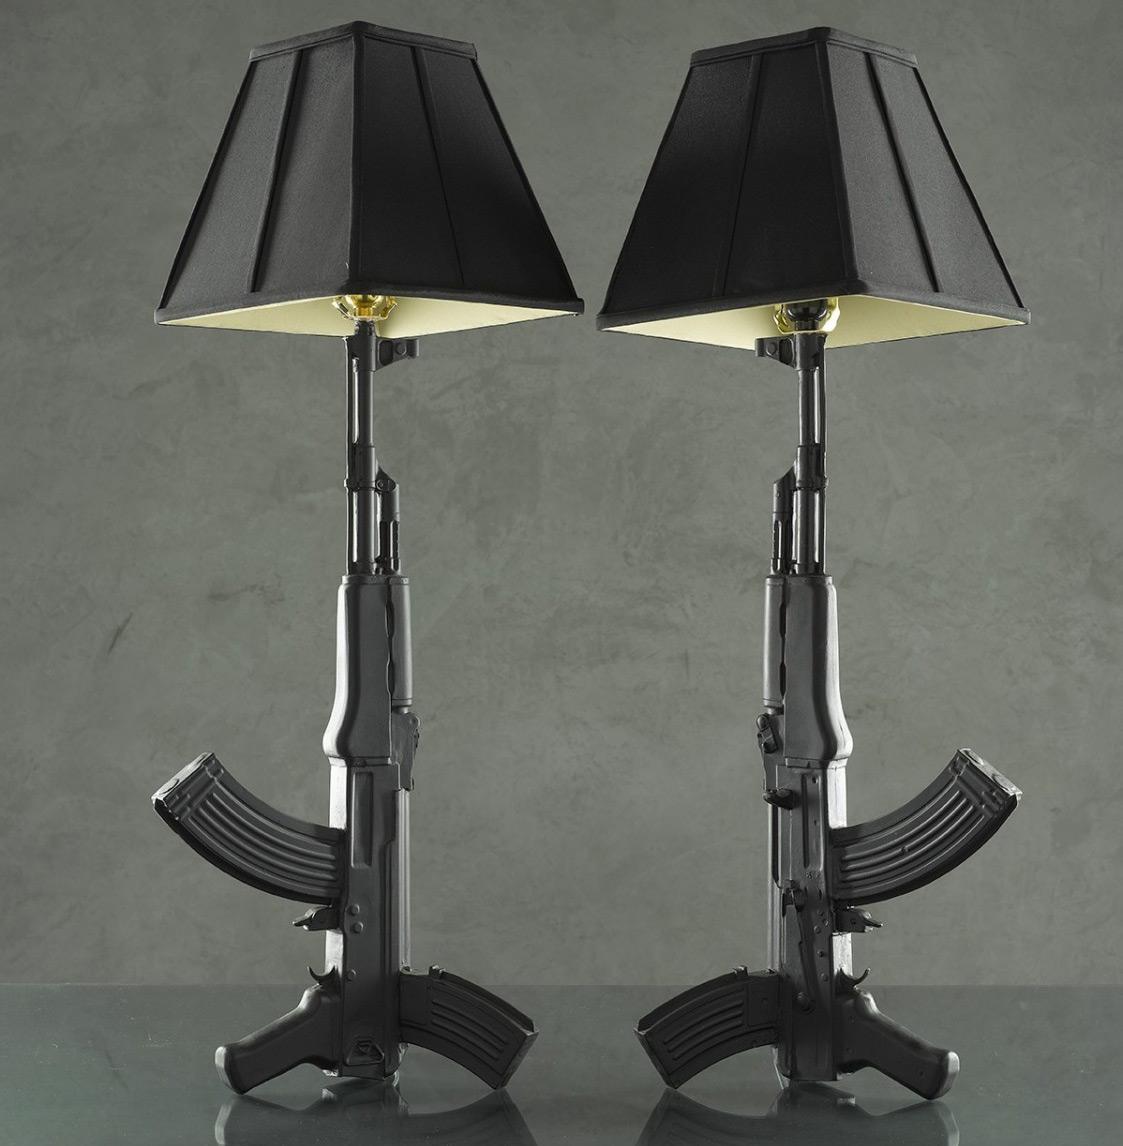 boondock saints lamp intriguing piece for your home warisan lighting. Black Bedroom Furniture Sets. Home Design Ideas